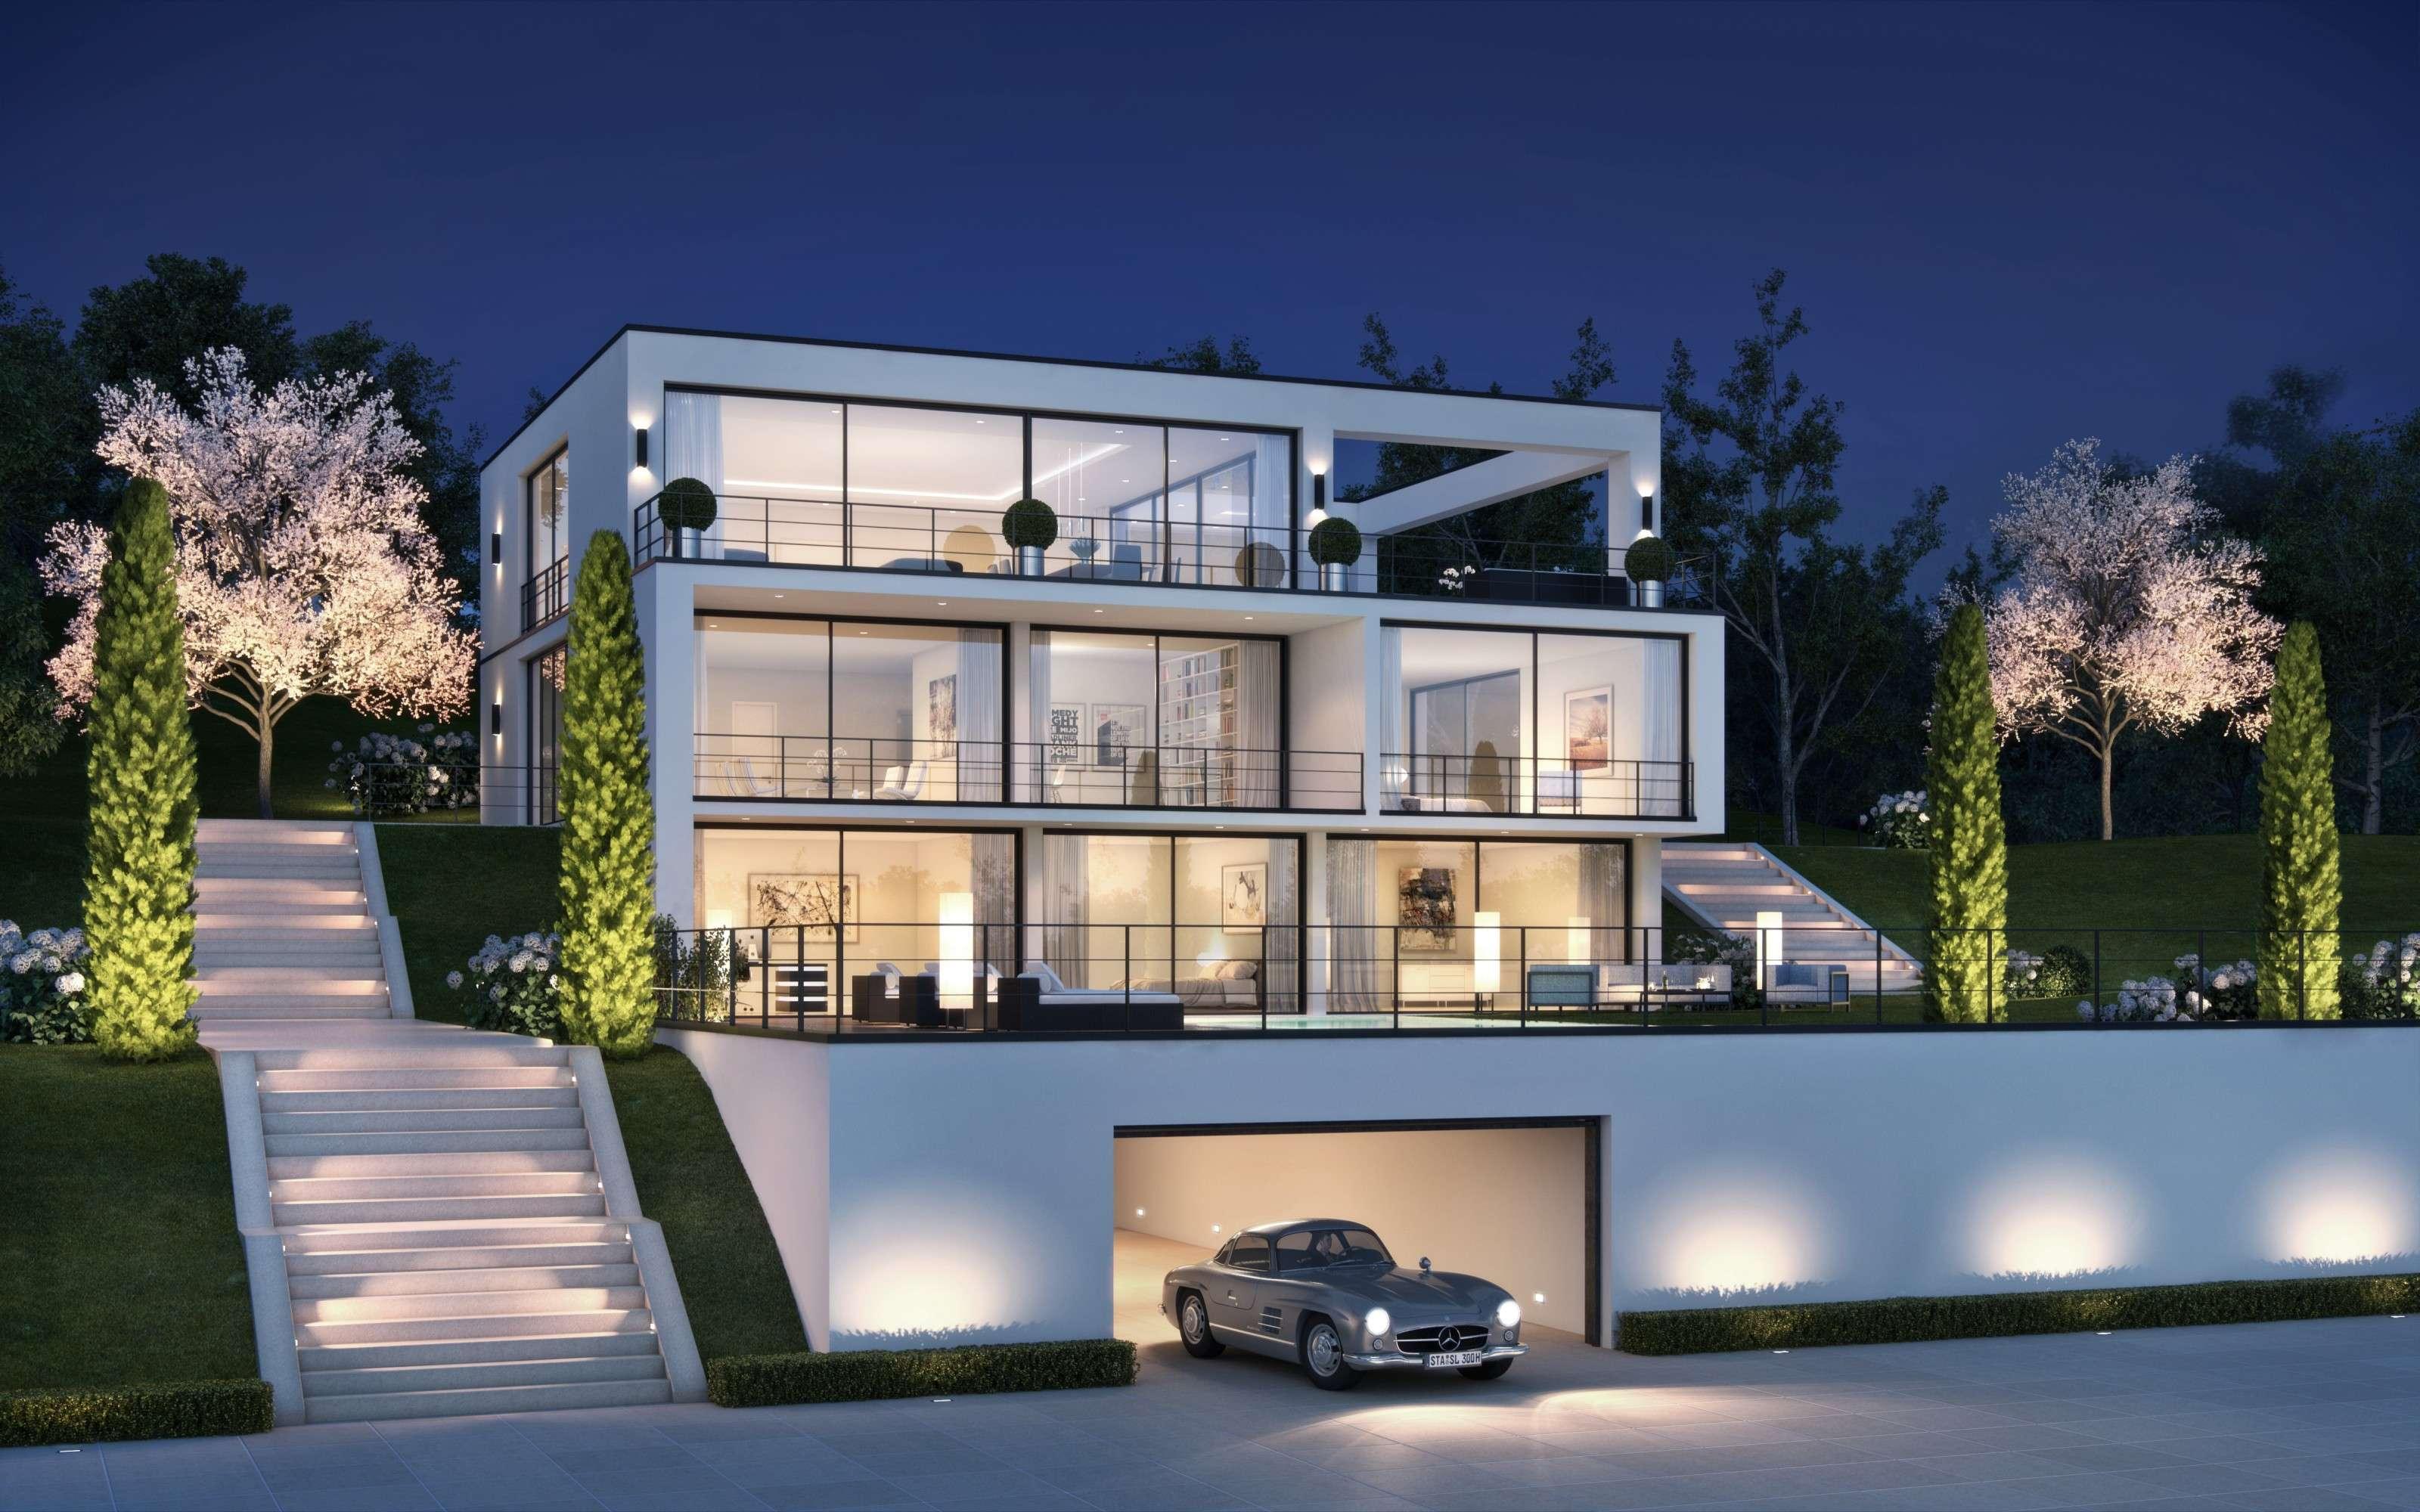 villa starnberg 3d visualisierung m nchen rendeffect gmbh. Black Bedroom Furniture Sets. Home Design Ideas